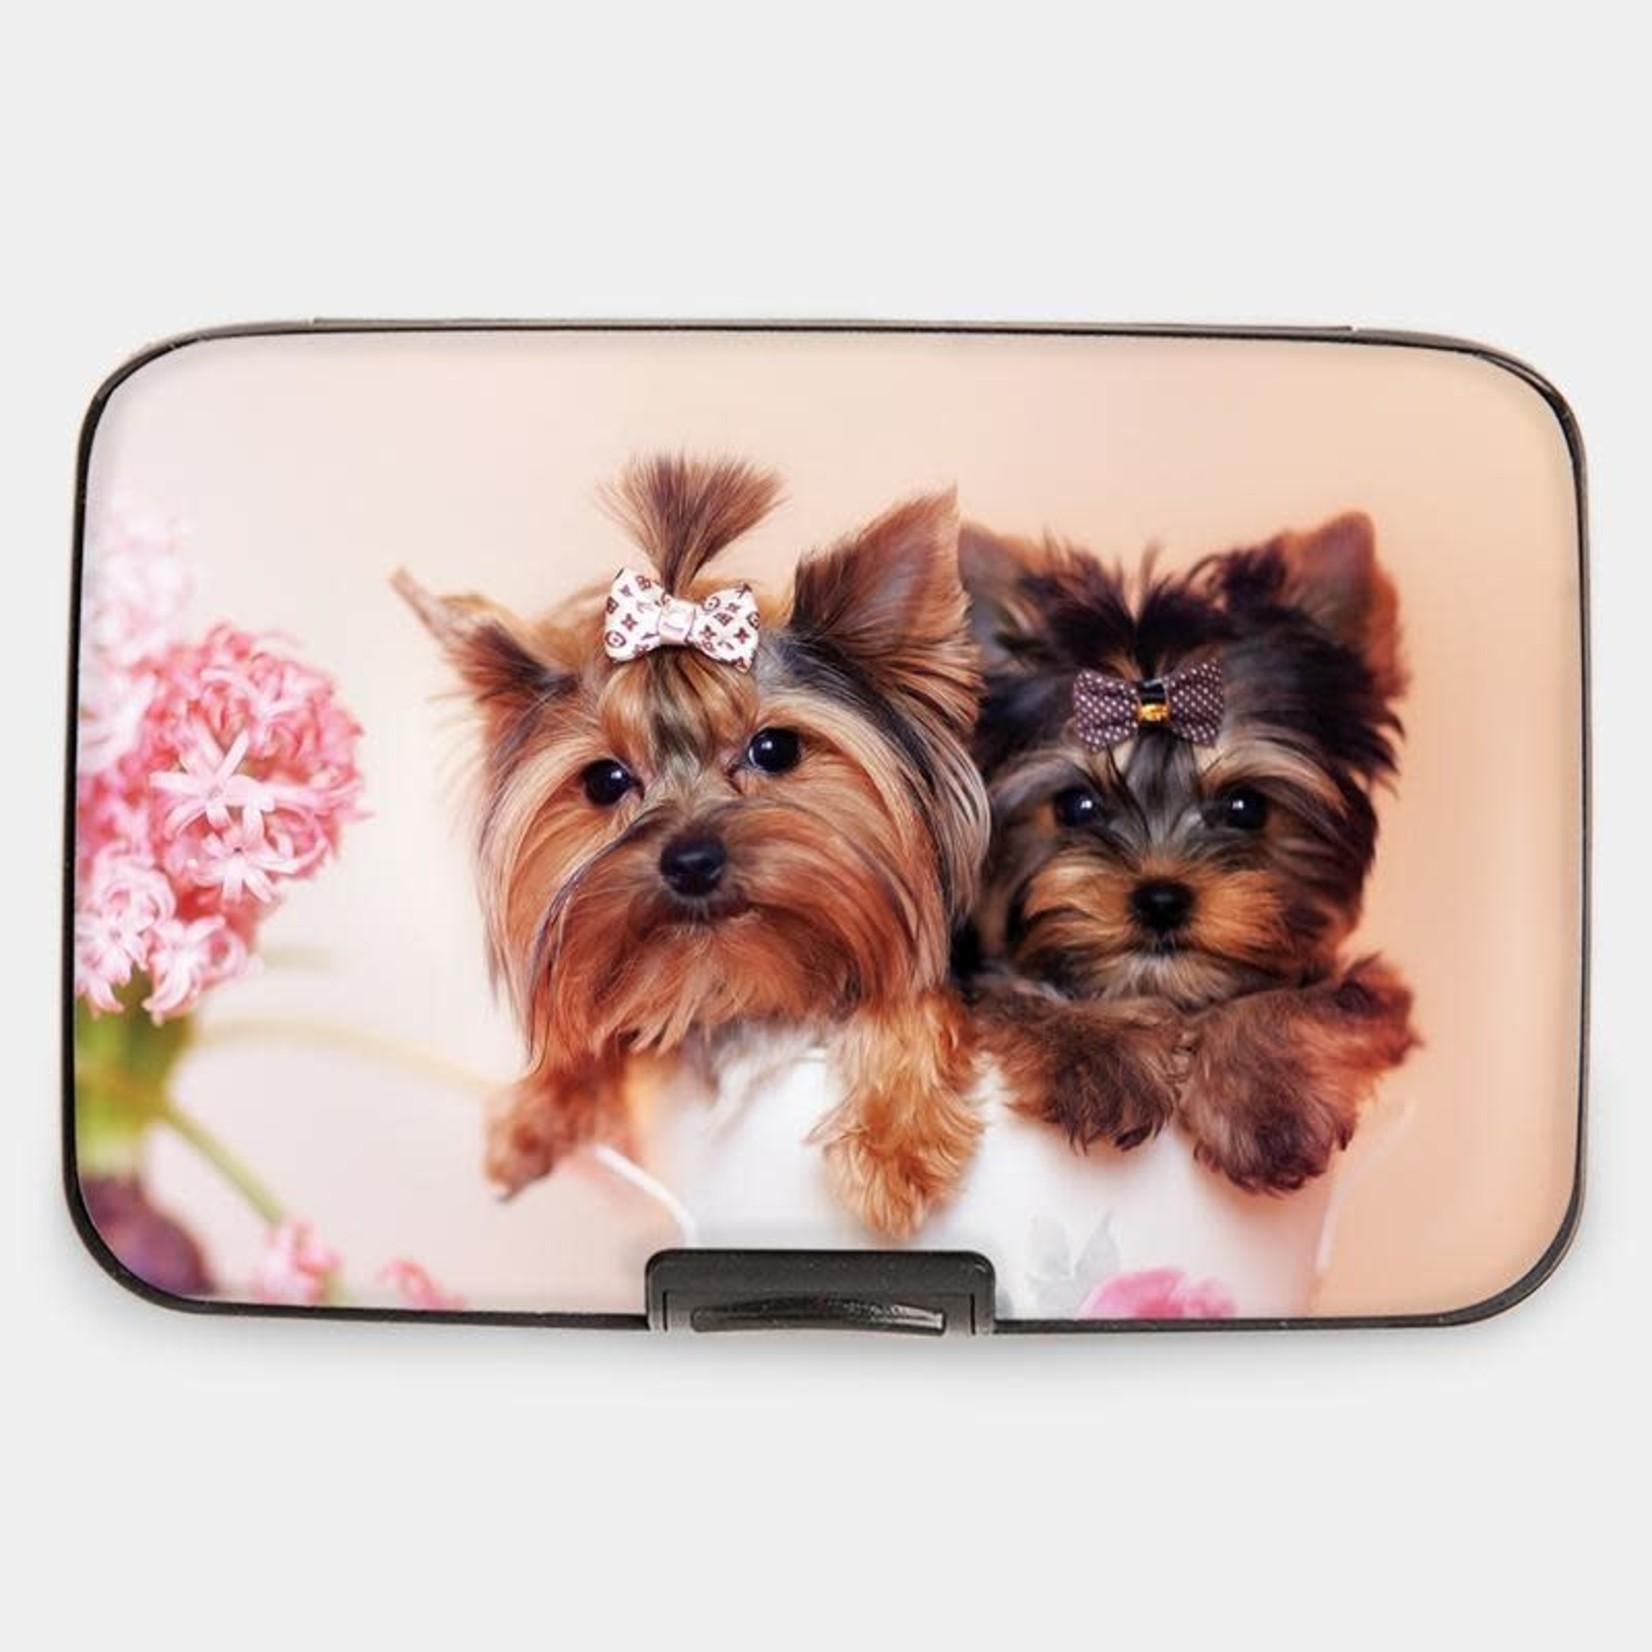 Monarque Armored Wallet - Puppies Yorkie